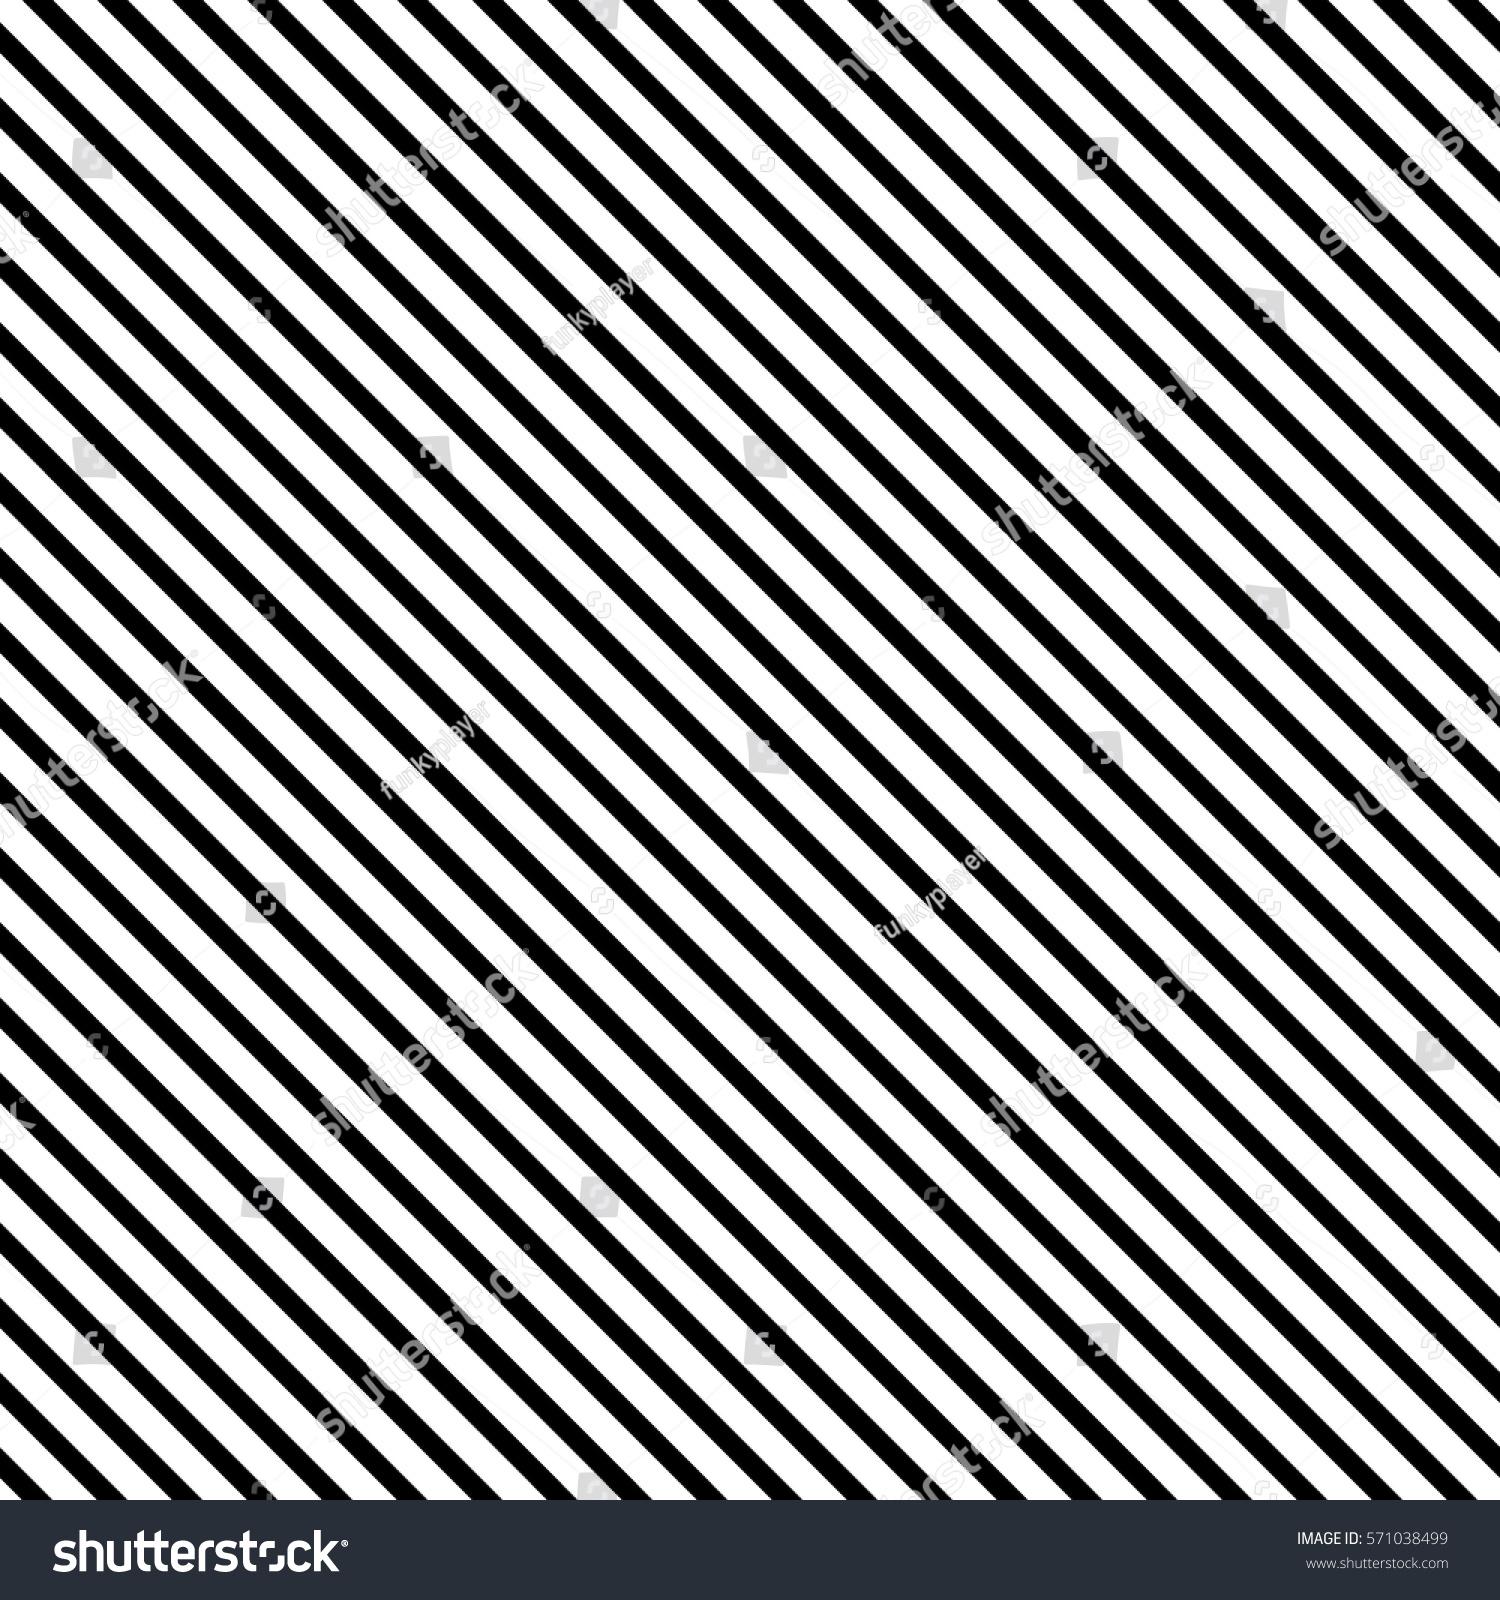 And black diagonal stripes background seamless background or wallpaper - Black Diagonal Lines Striped Wallpaper Seamless Surface Pattern Design With Symmetrical Linear Ornament